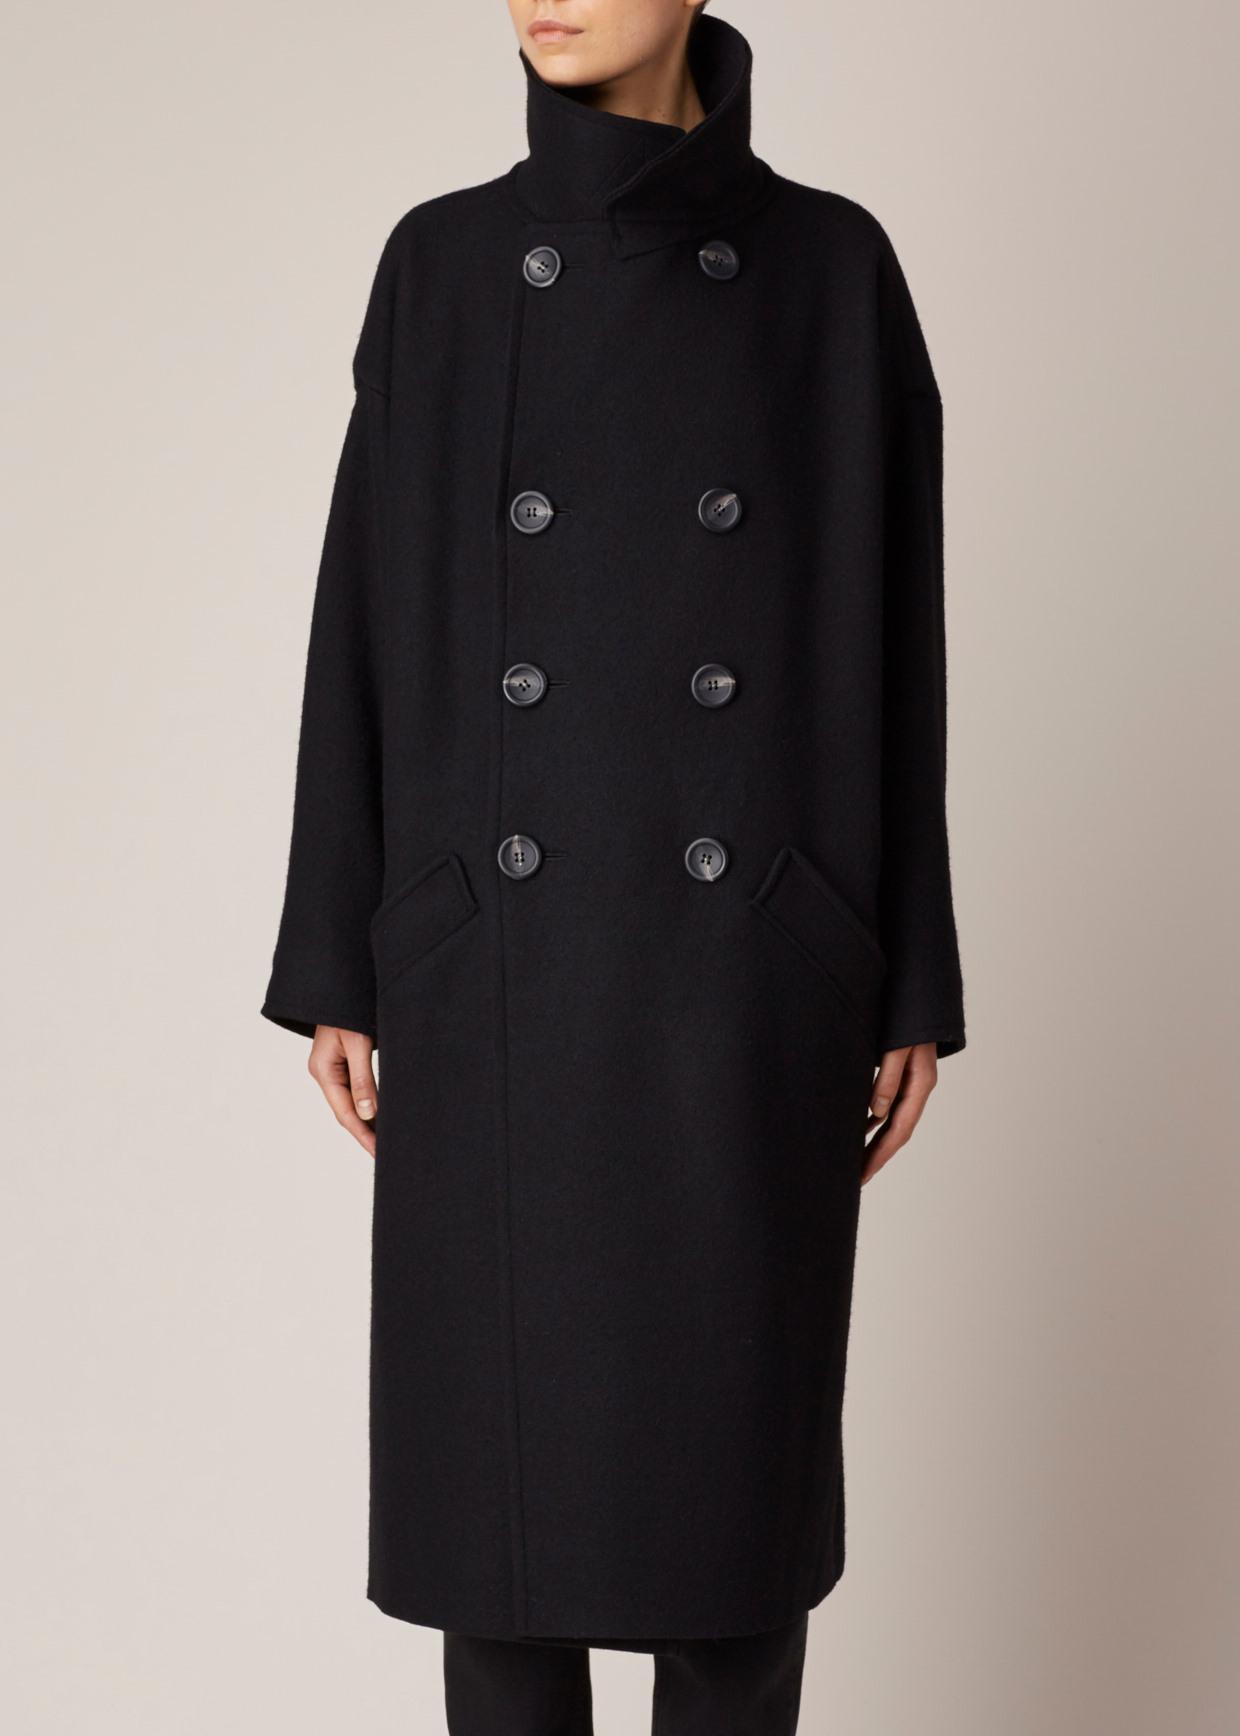 Y's yohji yamamoto Black Big Coat in Black | Lyst